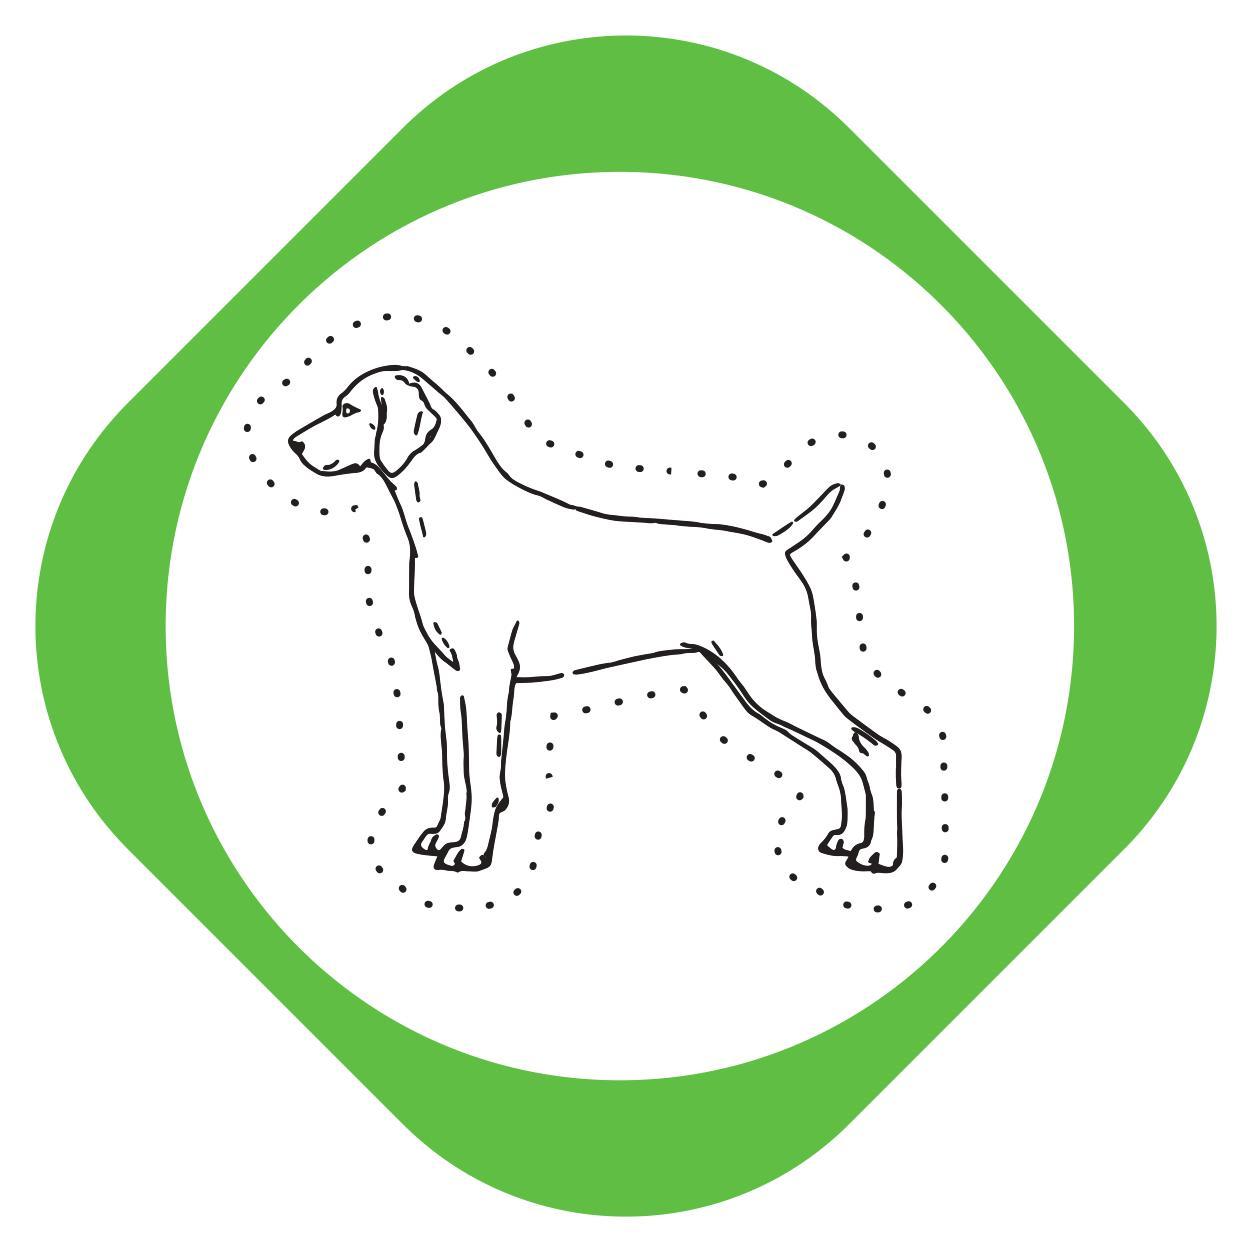 https://pets.alfa-vet.com/image/catalog/avatars/0032.jpg